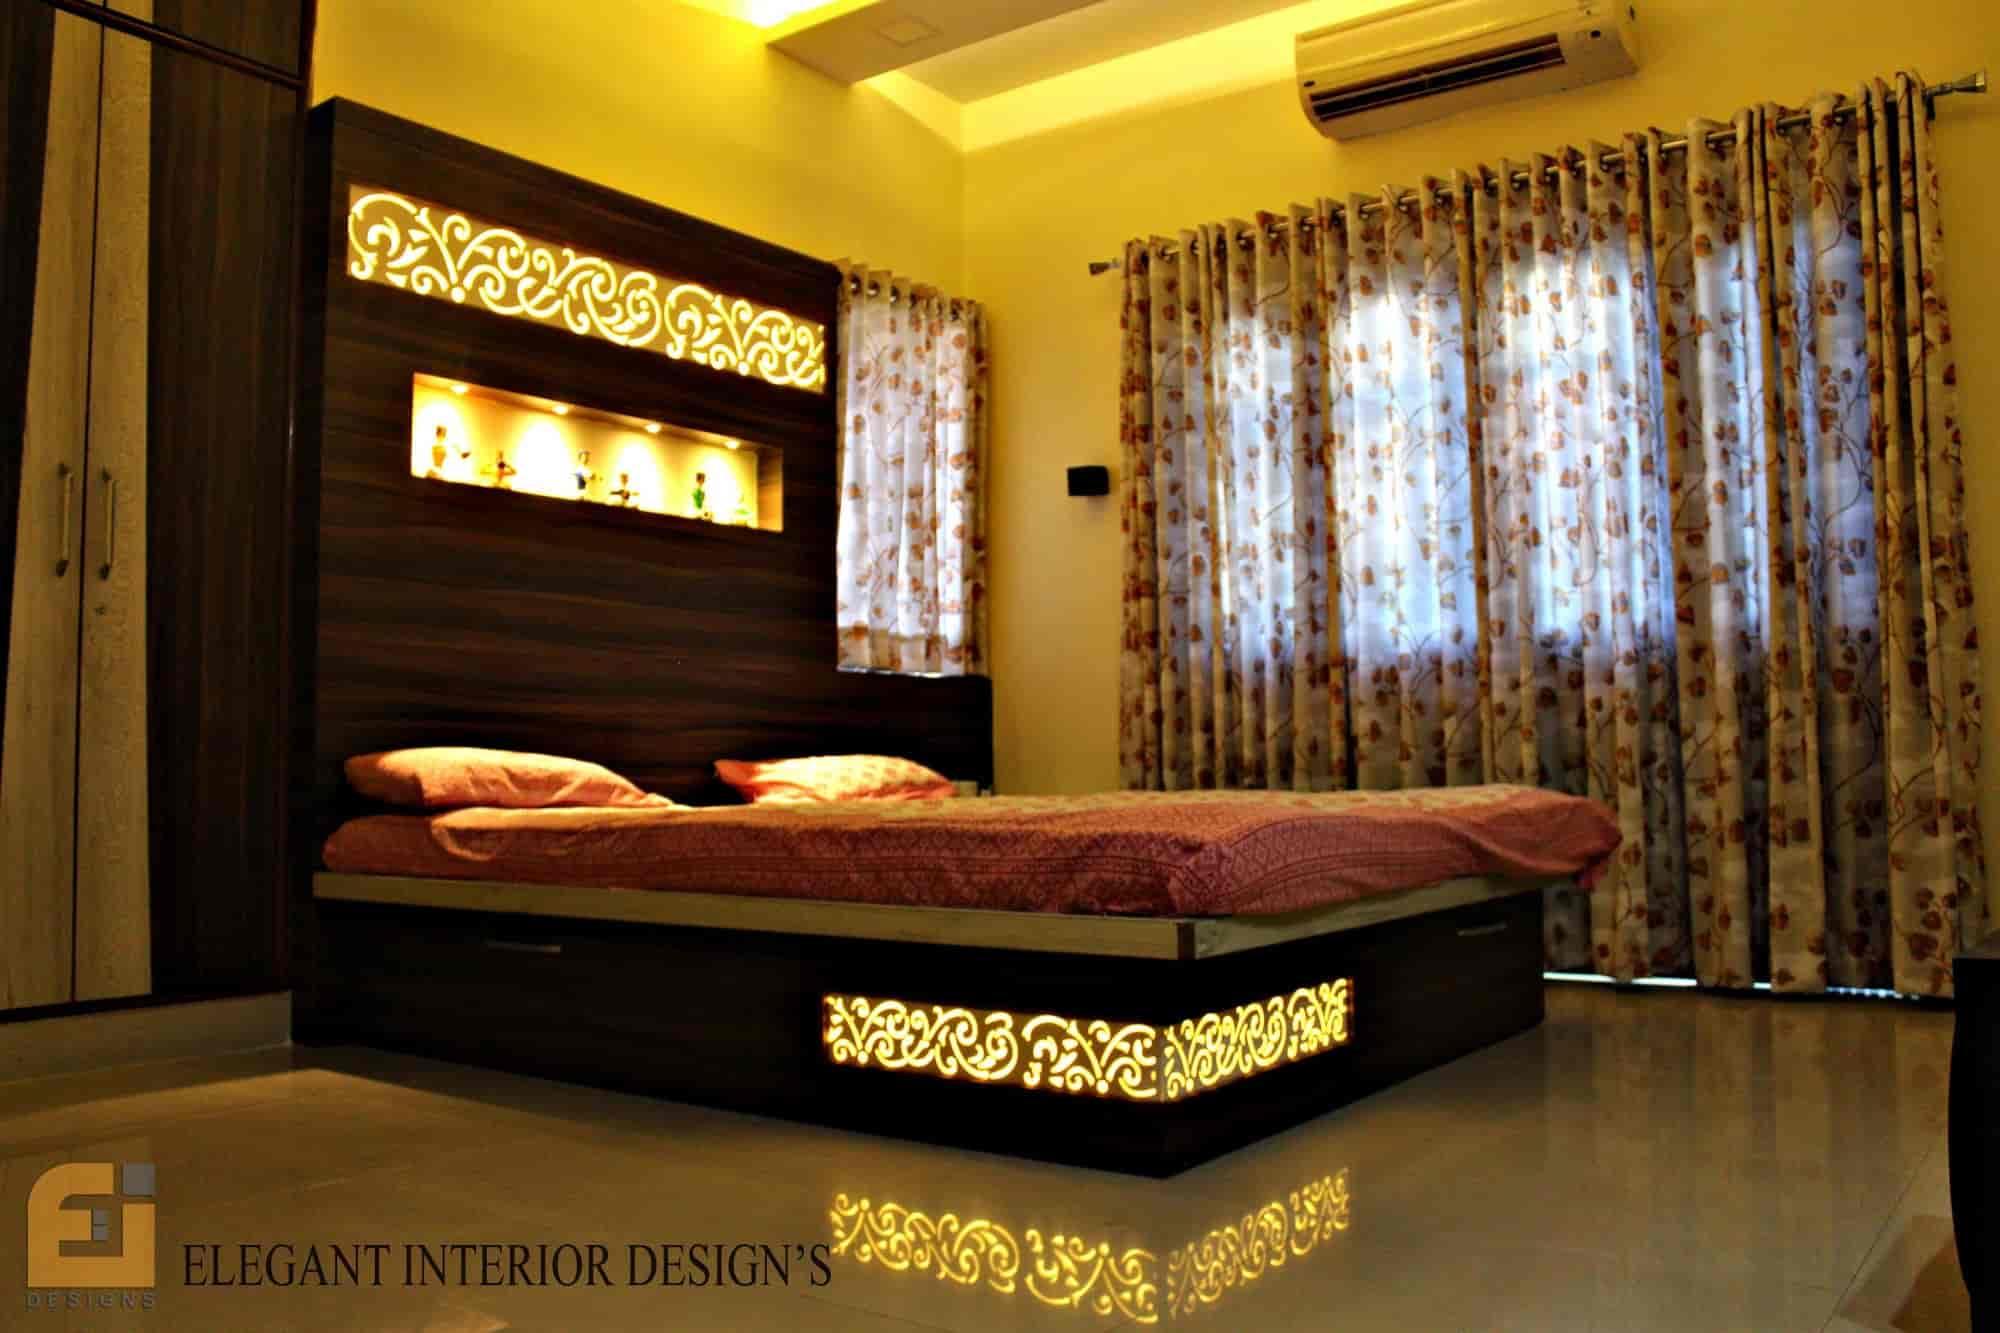 Elegant interior designs photos shivaji peth kolhapur interior designers